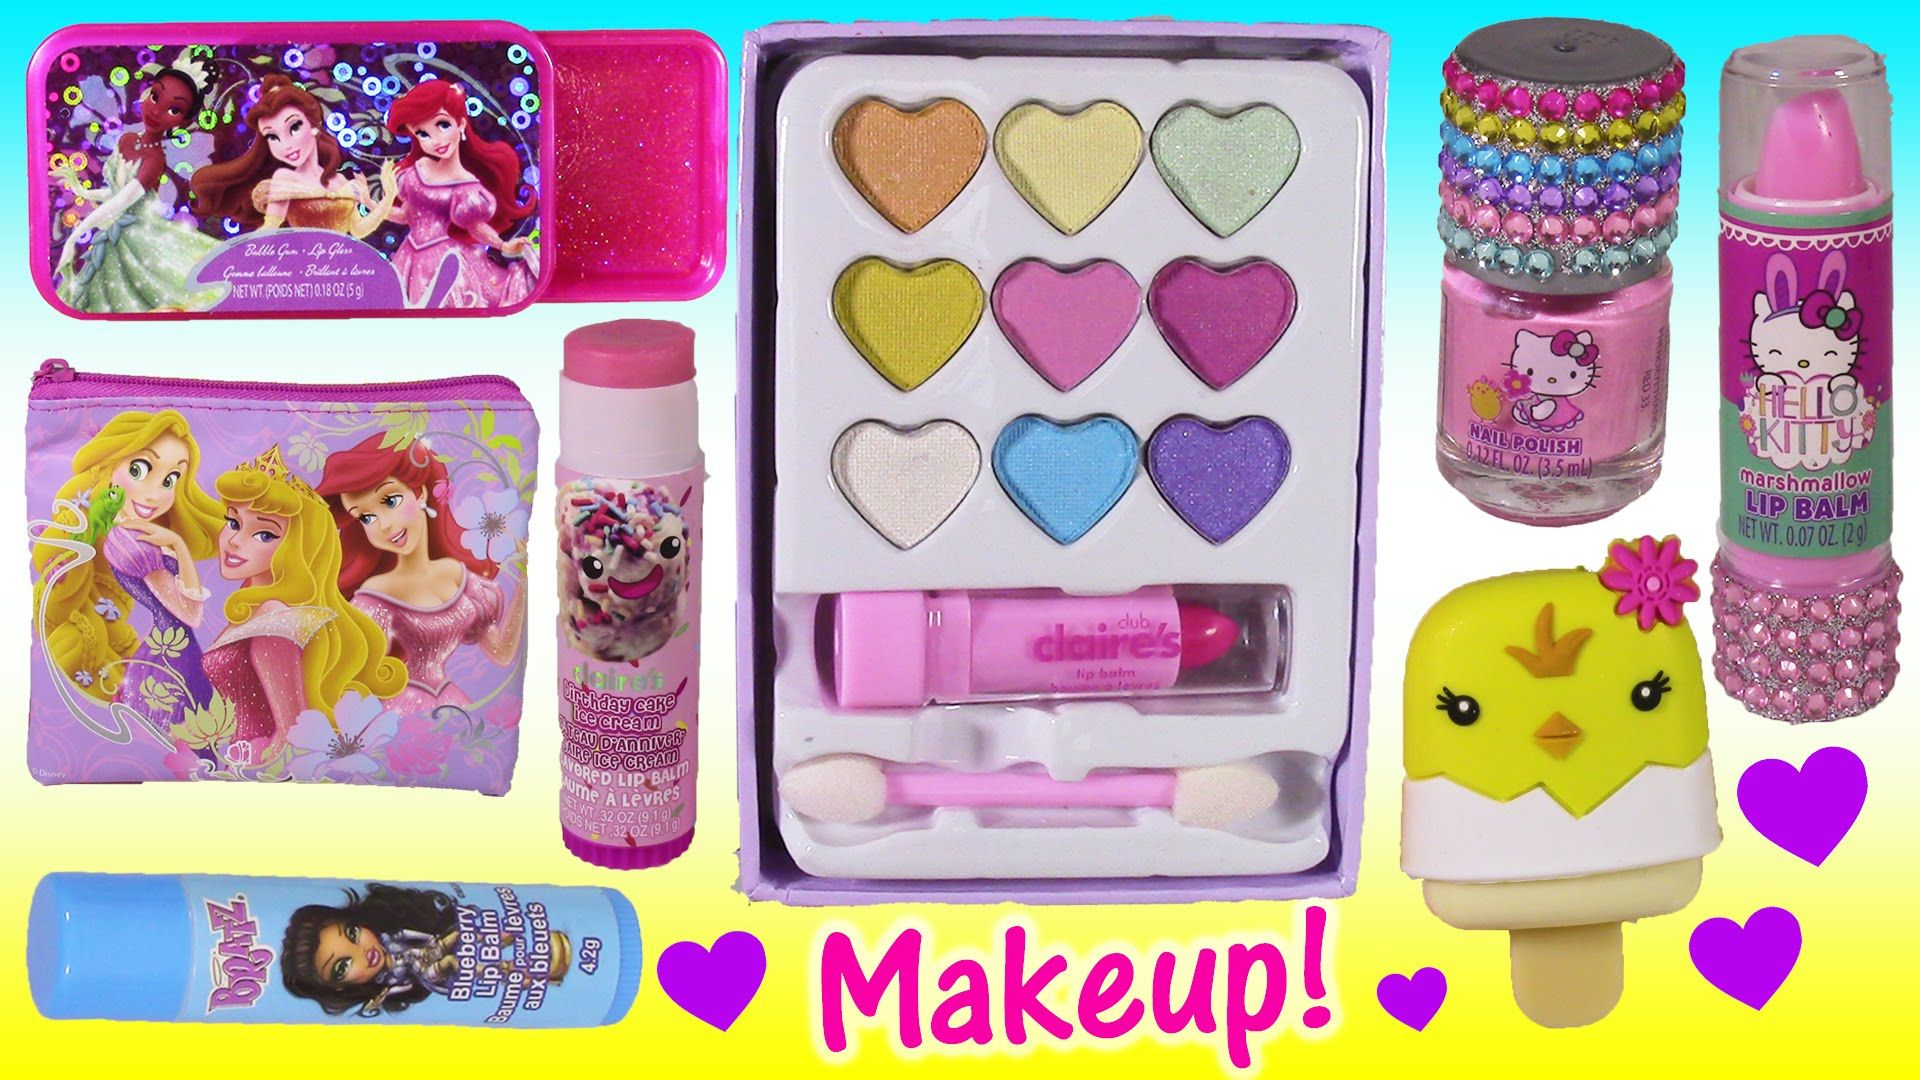 2c2e0f1886 Makeup Beauty Bonanza 2! Lip Balm Hello Kitty Disney Princess Lip GLOSS! Fun  Squishies